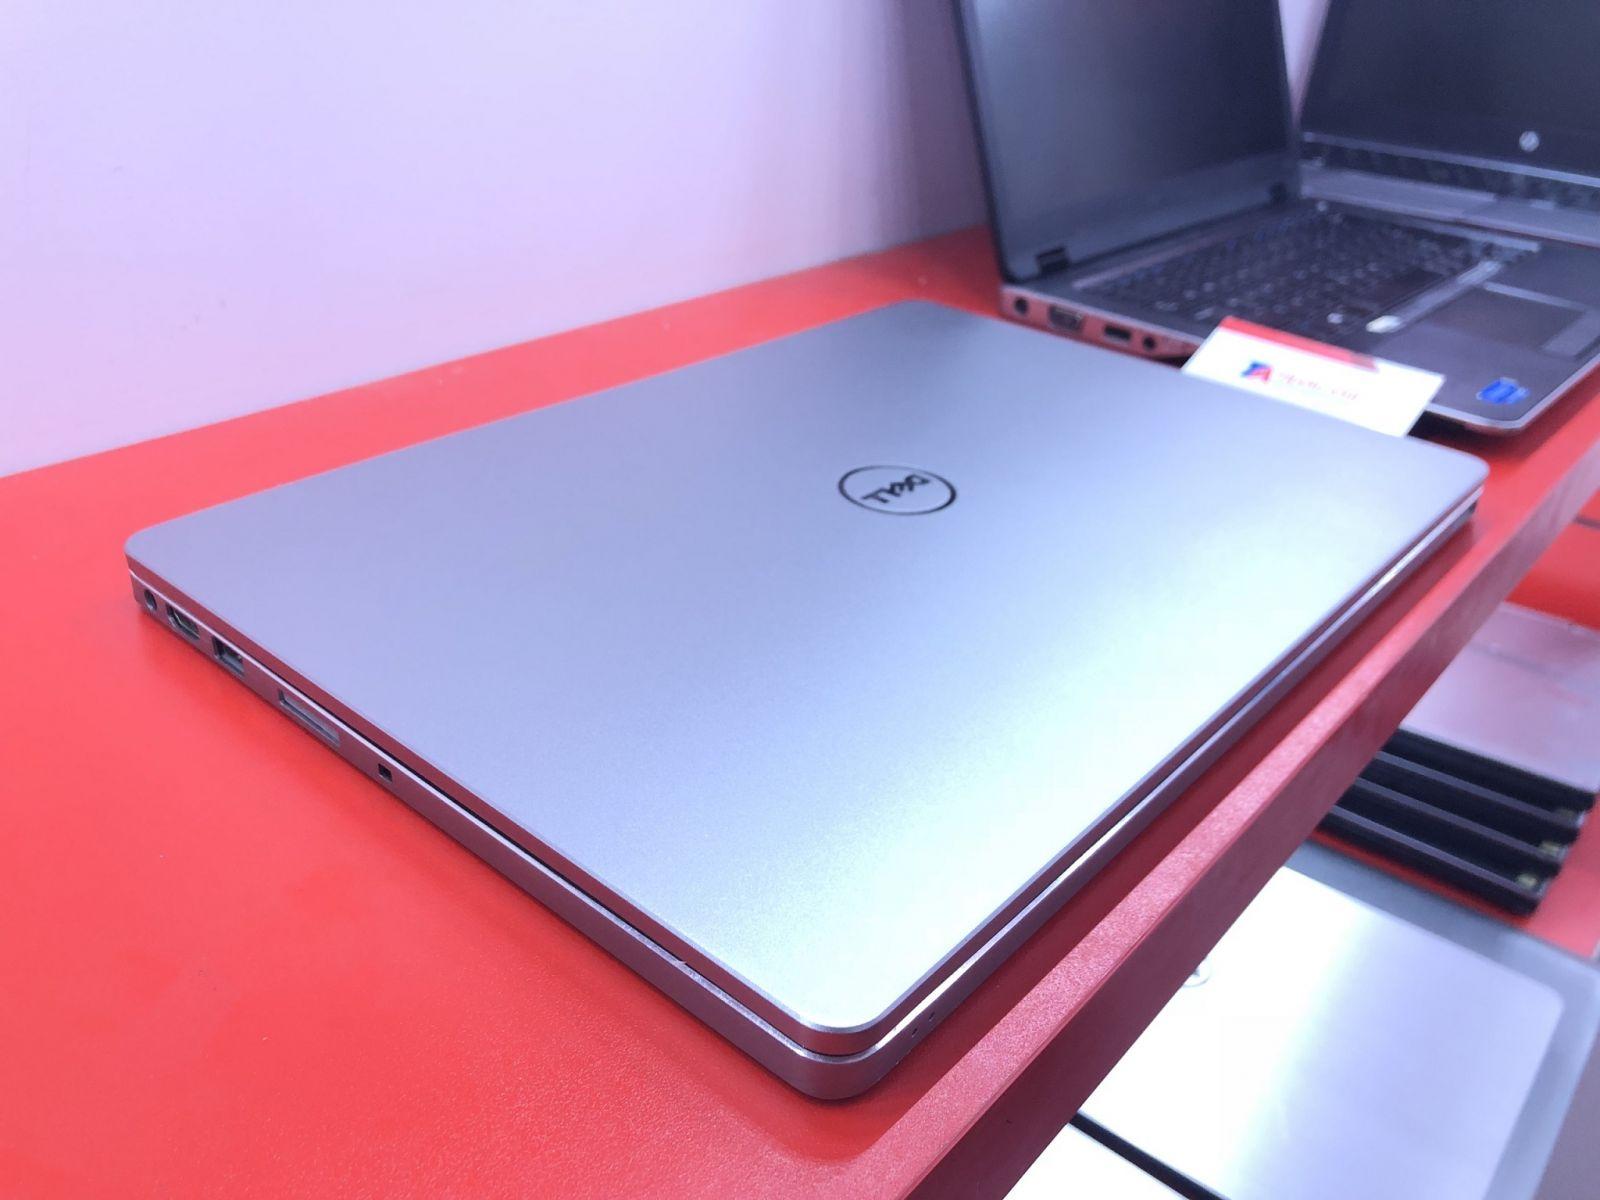 http://laptoptranganh.com/sanpham/dell-inspiron-7437-man-cam-ung-sieu-mong-nhap-my-nguyen-ban-m%E1%BB%9Bi-99/33.html